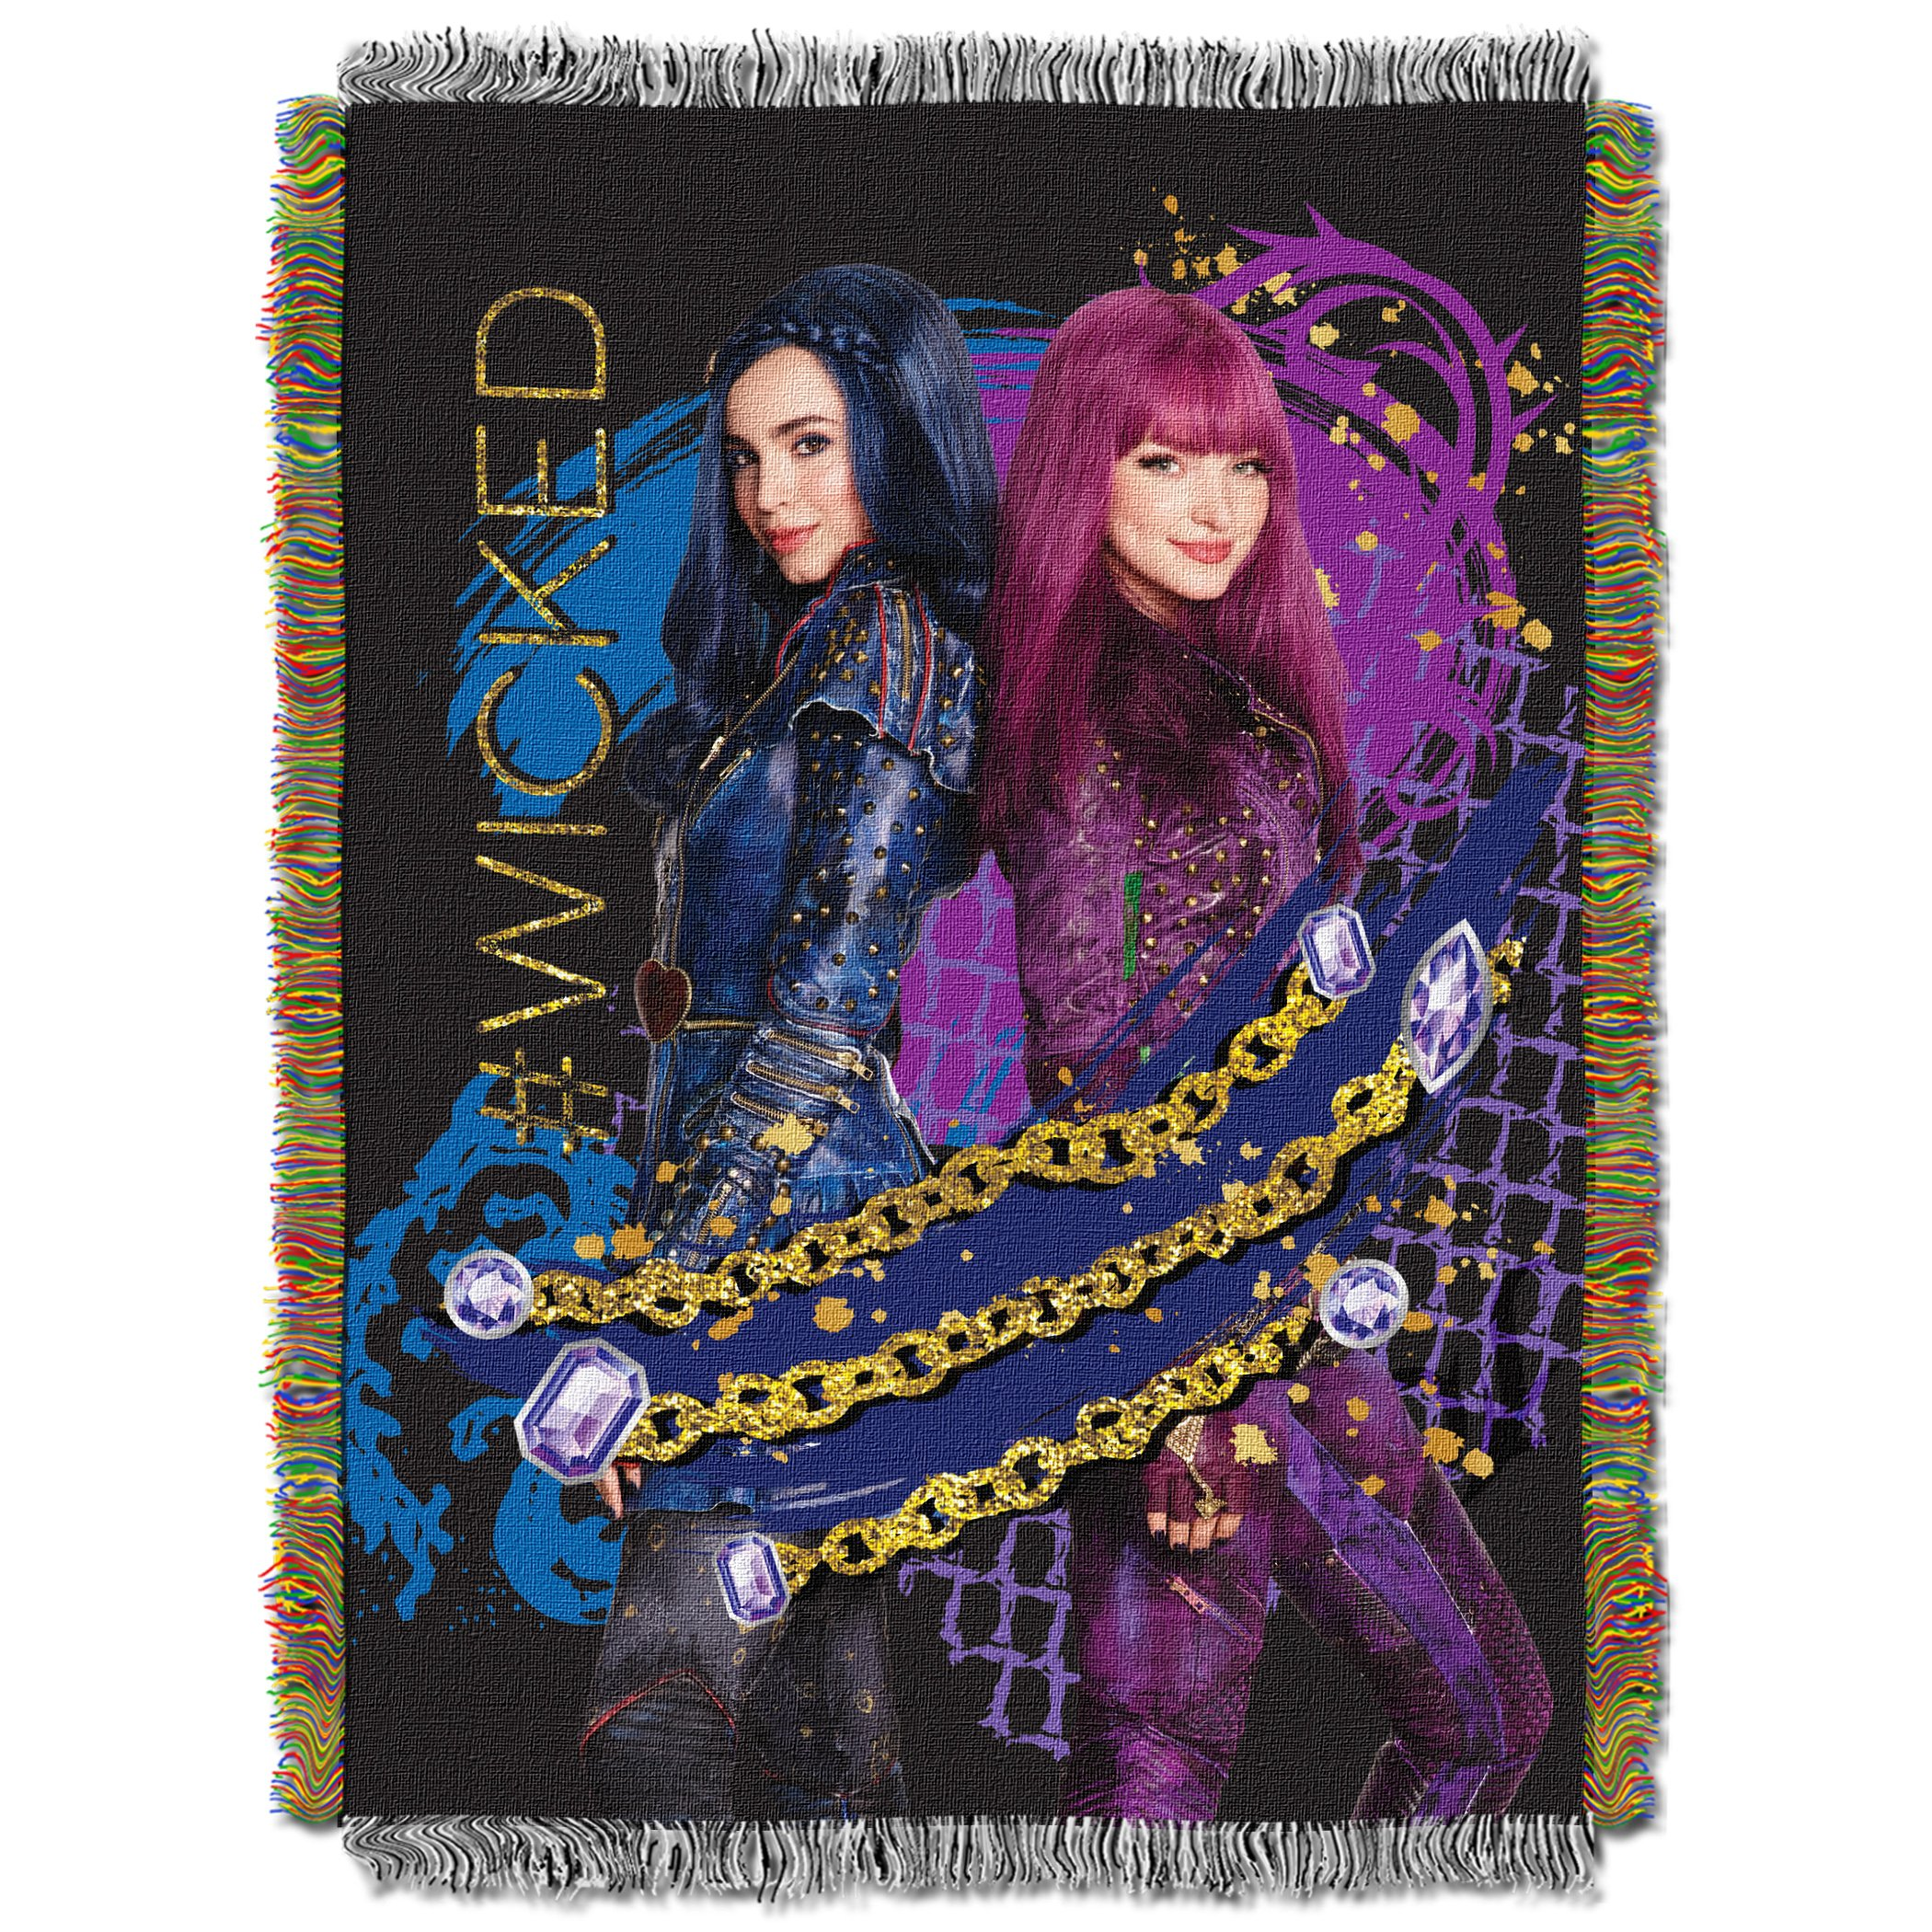 Disney's Descendants 2, ''Glitter Chains'' Woven Tapestry Throw Blanket, 48'' x 60'', Multi Color